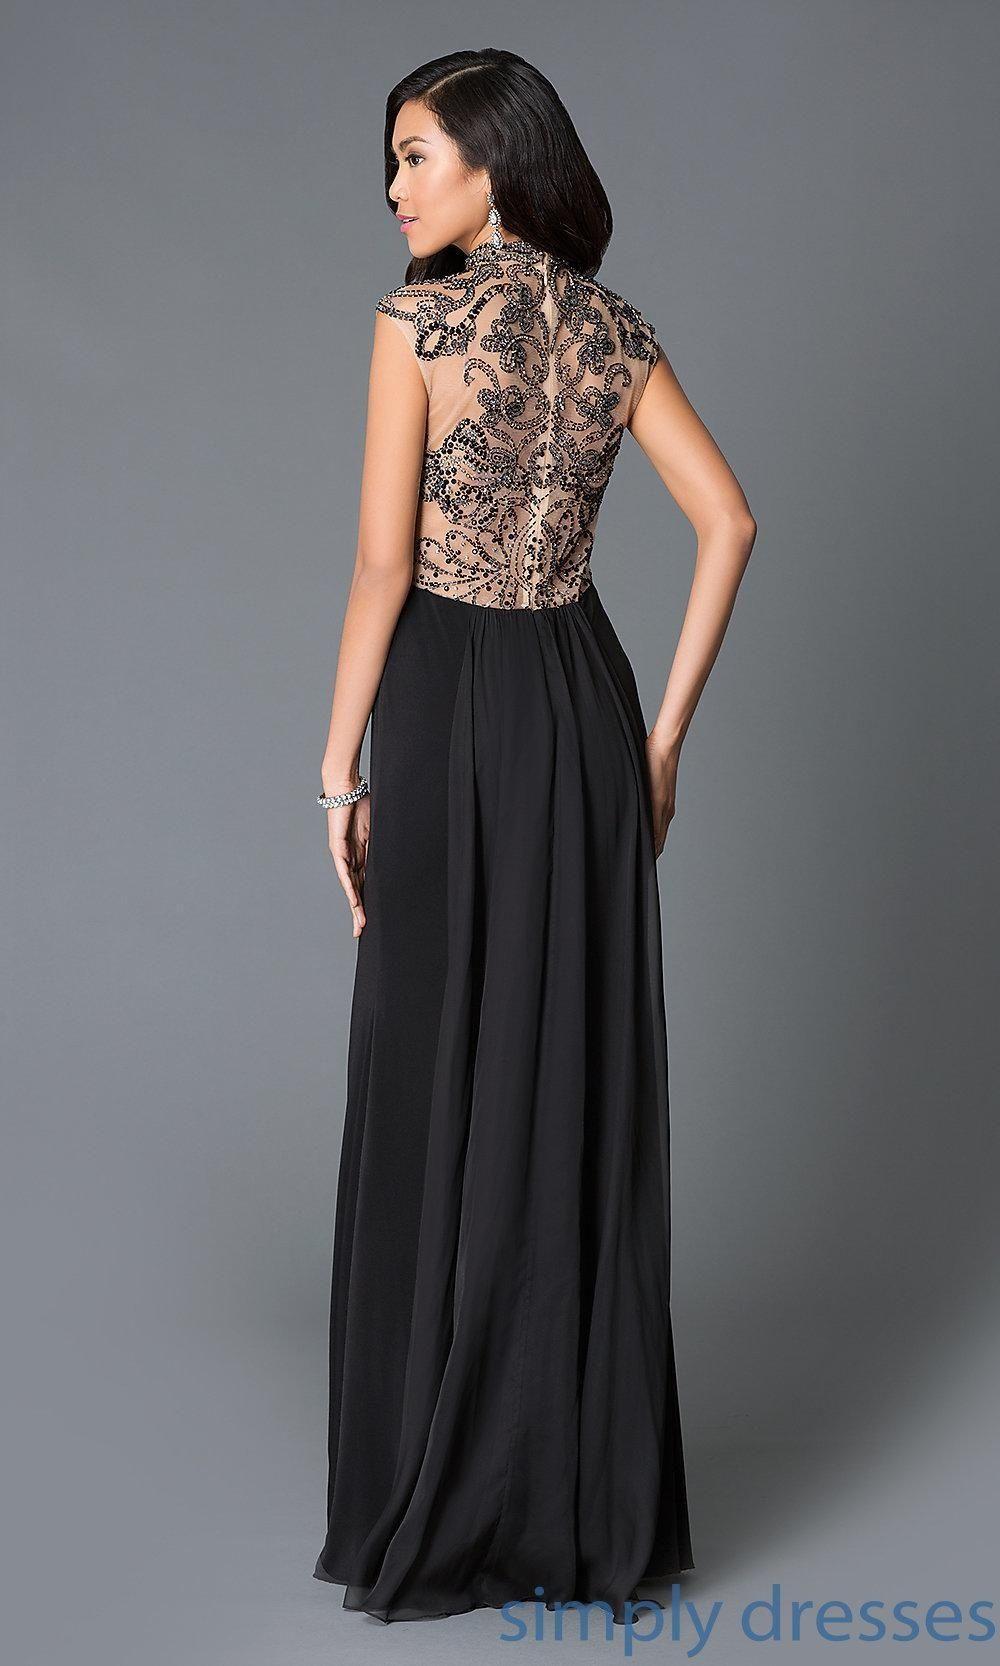 Jvn by jovani embellished back formal dress brought to you by